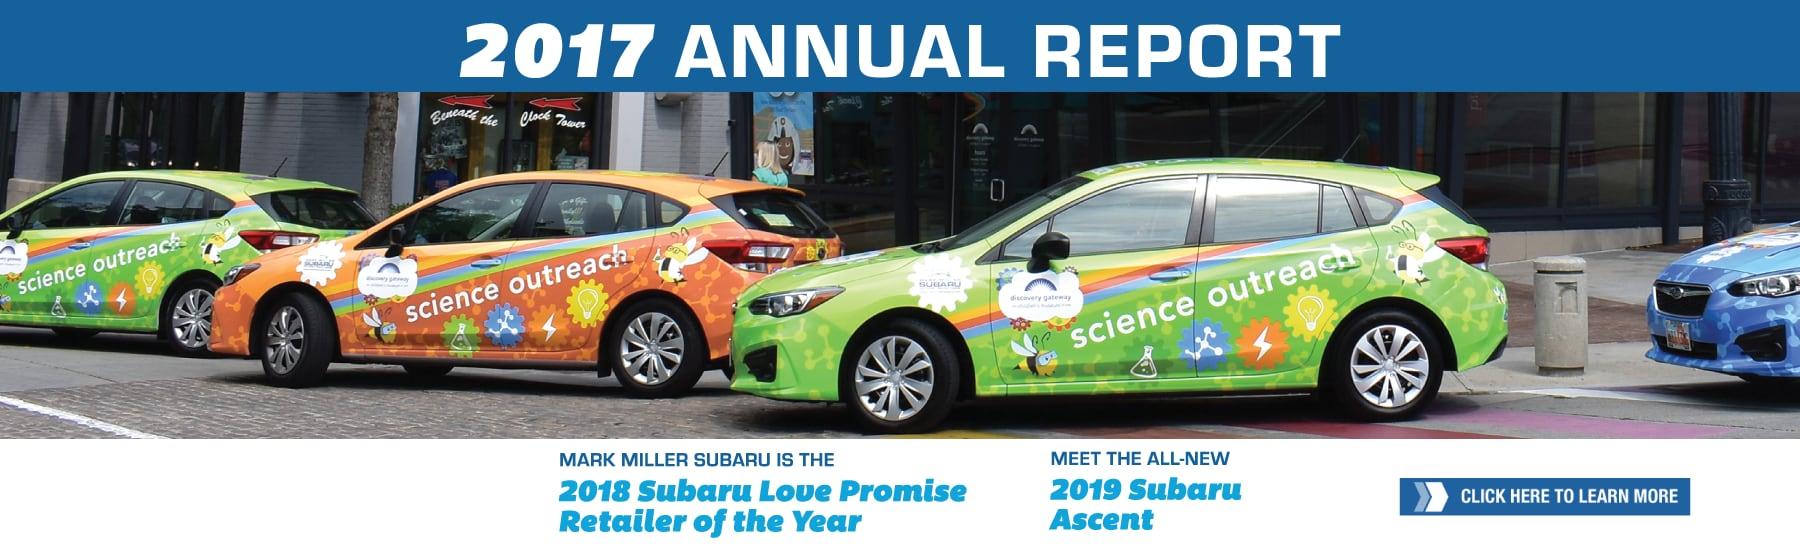 Mark Miller Subaru Southtowne >> Mark Miller Subaru South Towne: Dealer near Salt Lake City & Sandy